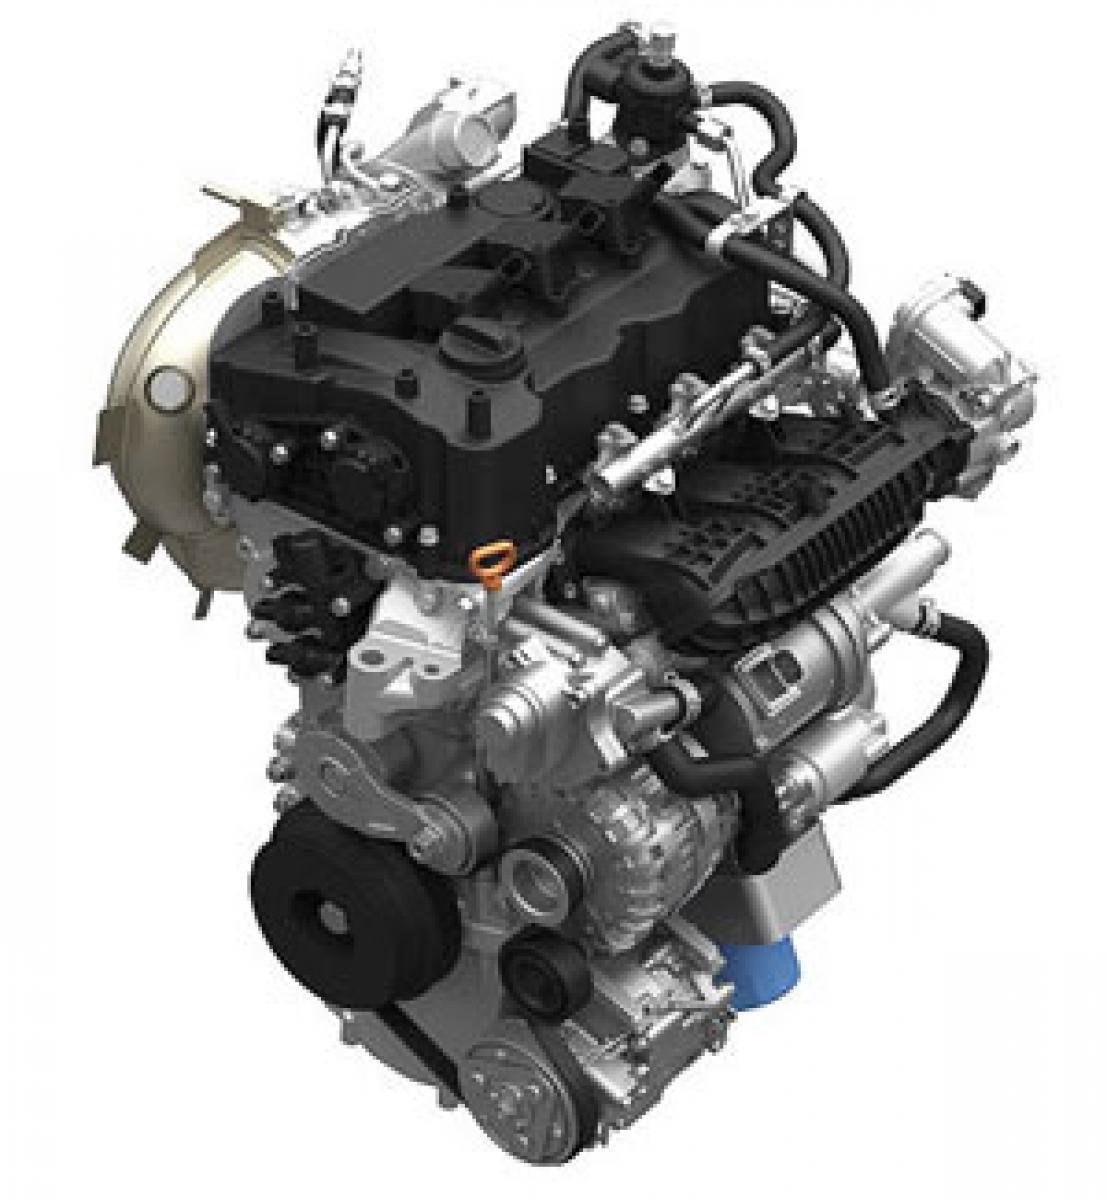 Honda unveils new 2.0-litre turbo engine